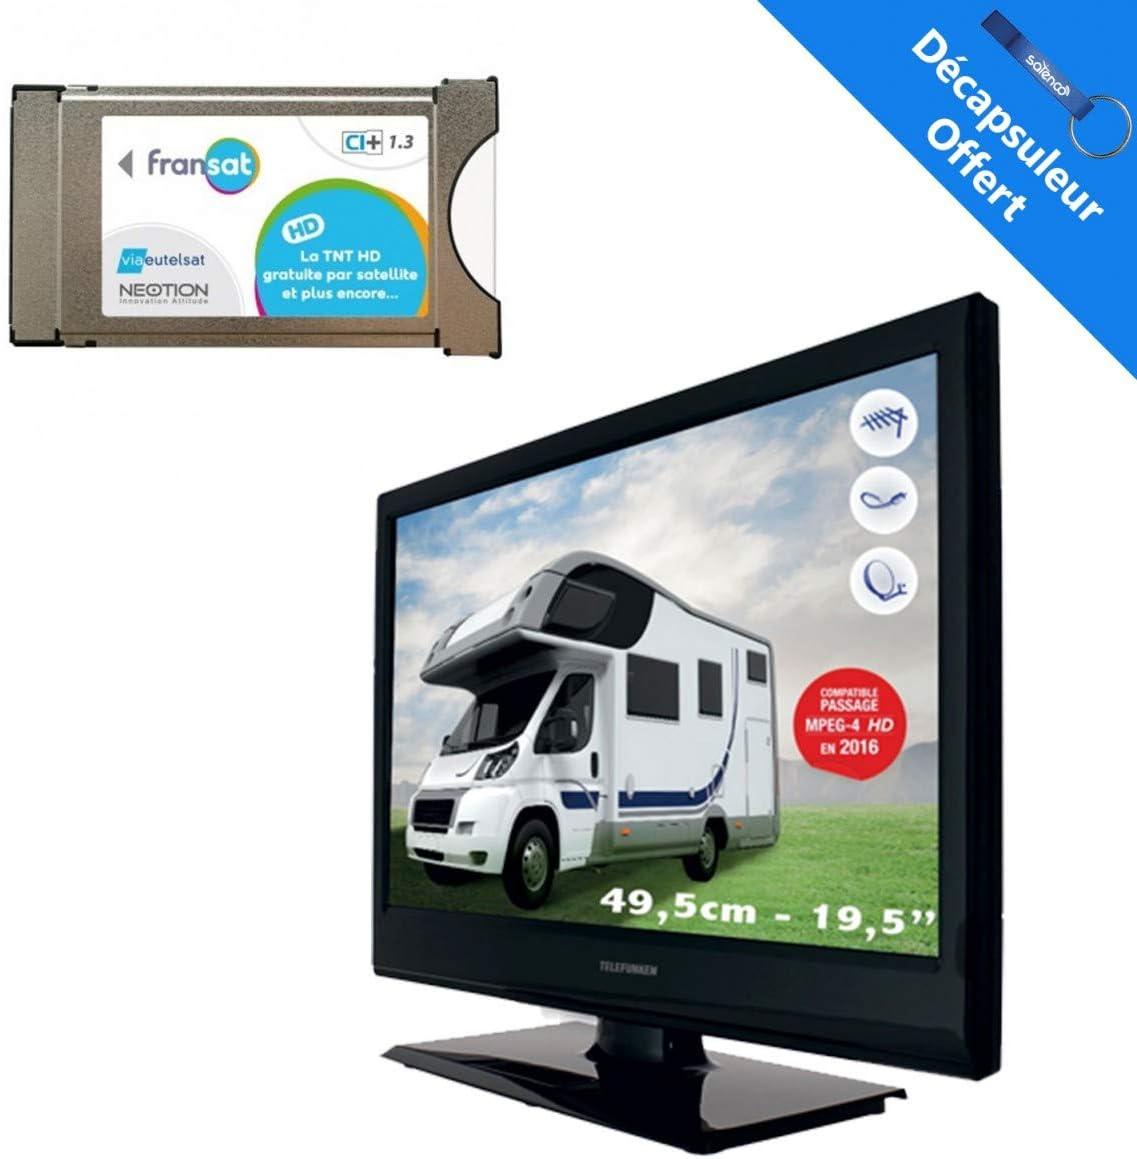 sedea Pack televisor Camping TV LED Telefunken 20 Pulgadas + Receptor Satellite Fransat con Tarjeta: Amazon.es: Electrónica